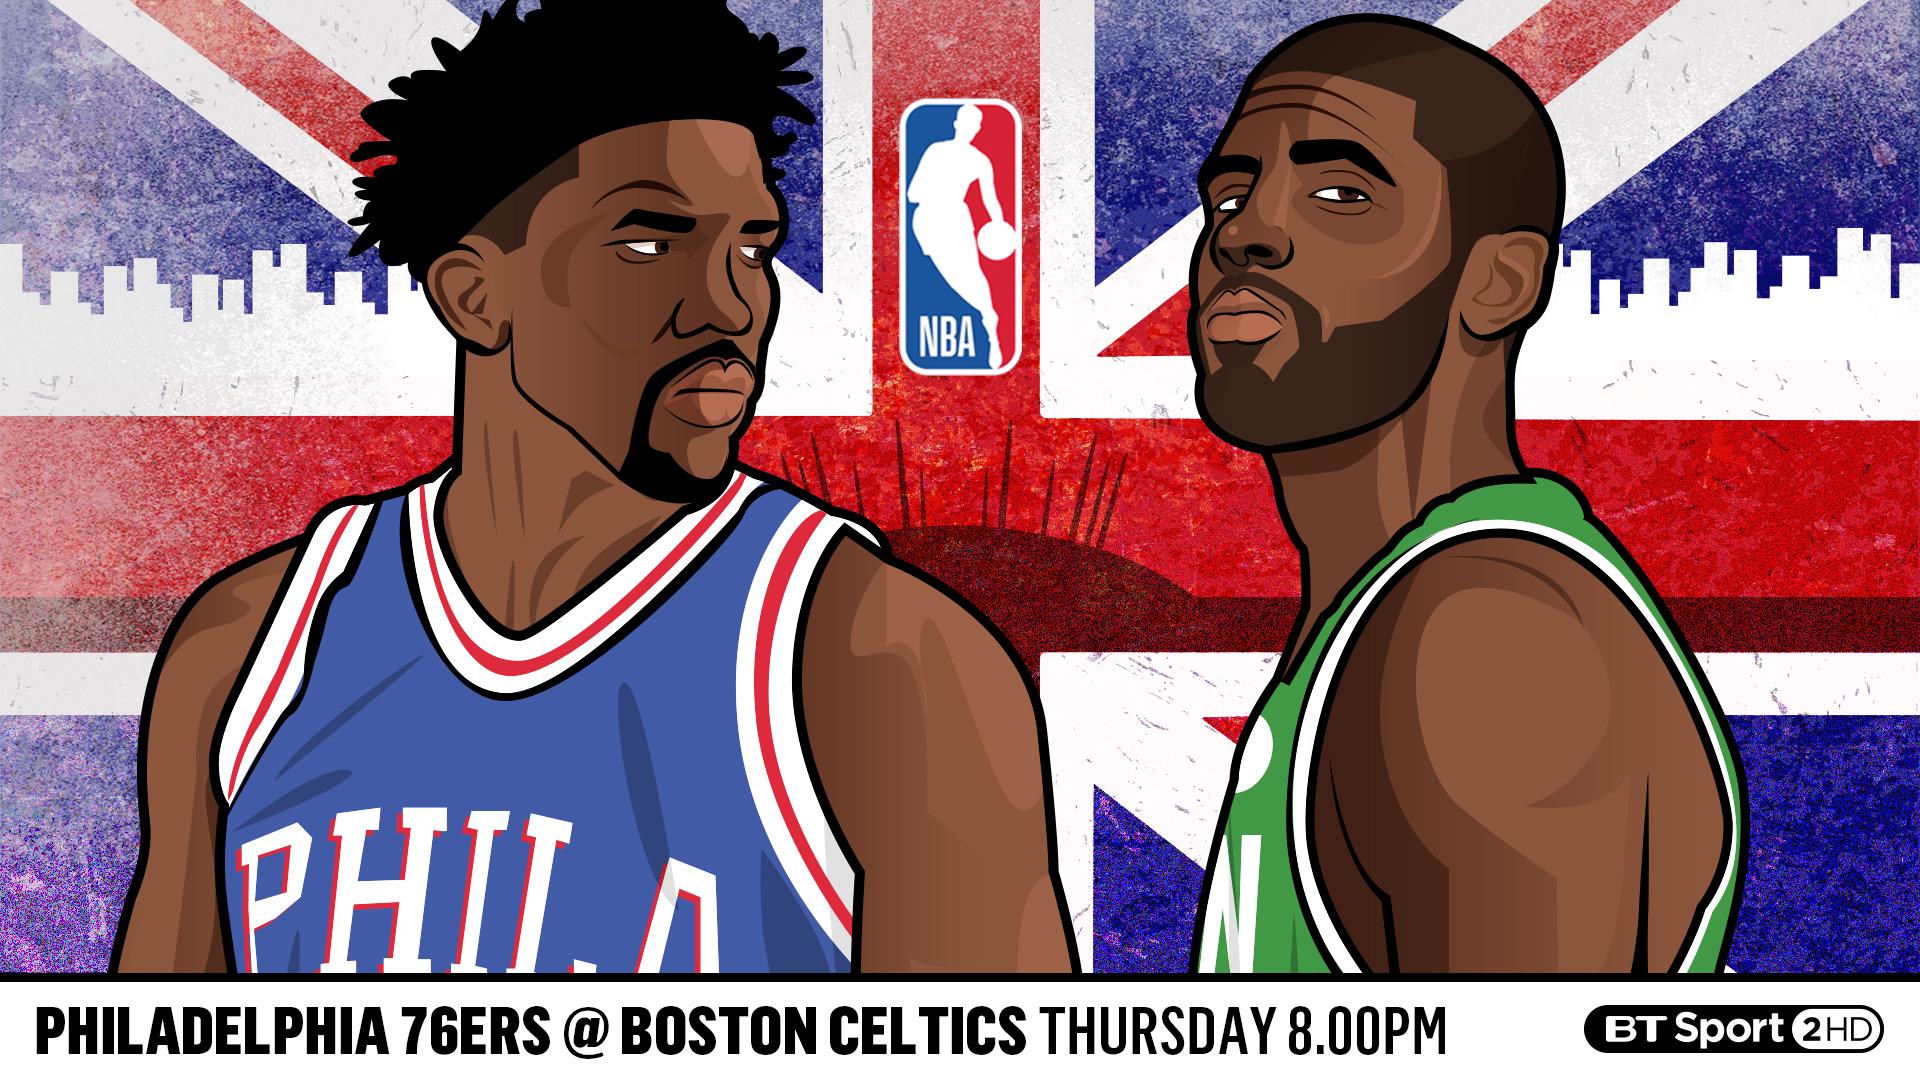 Philadephia-76ers-at-Boston-Celtics-_-NBA-London-v4_16x9.jpg